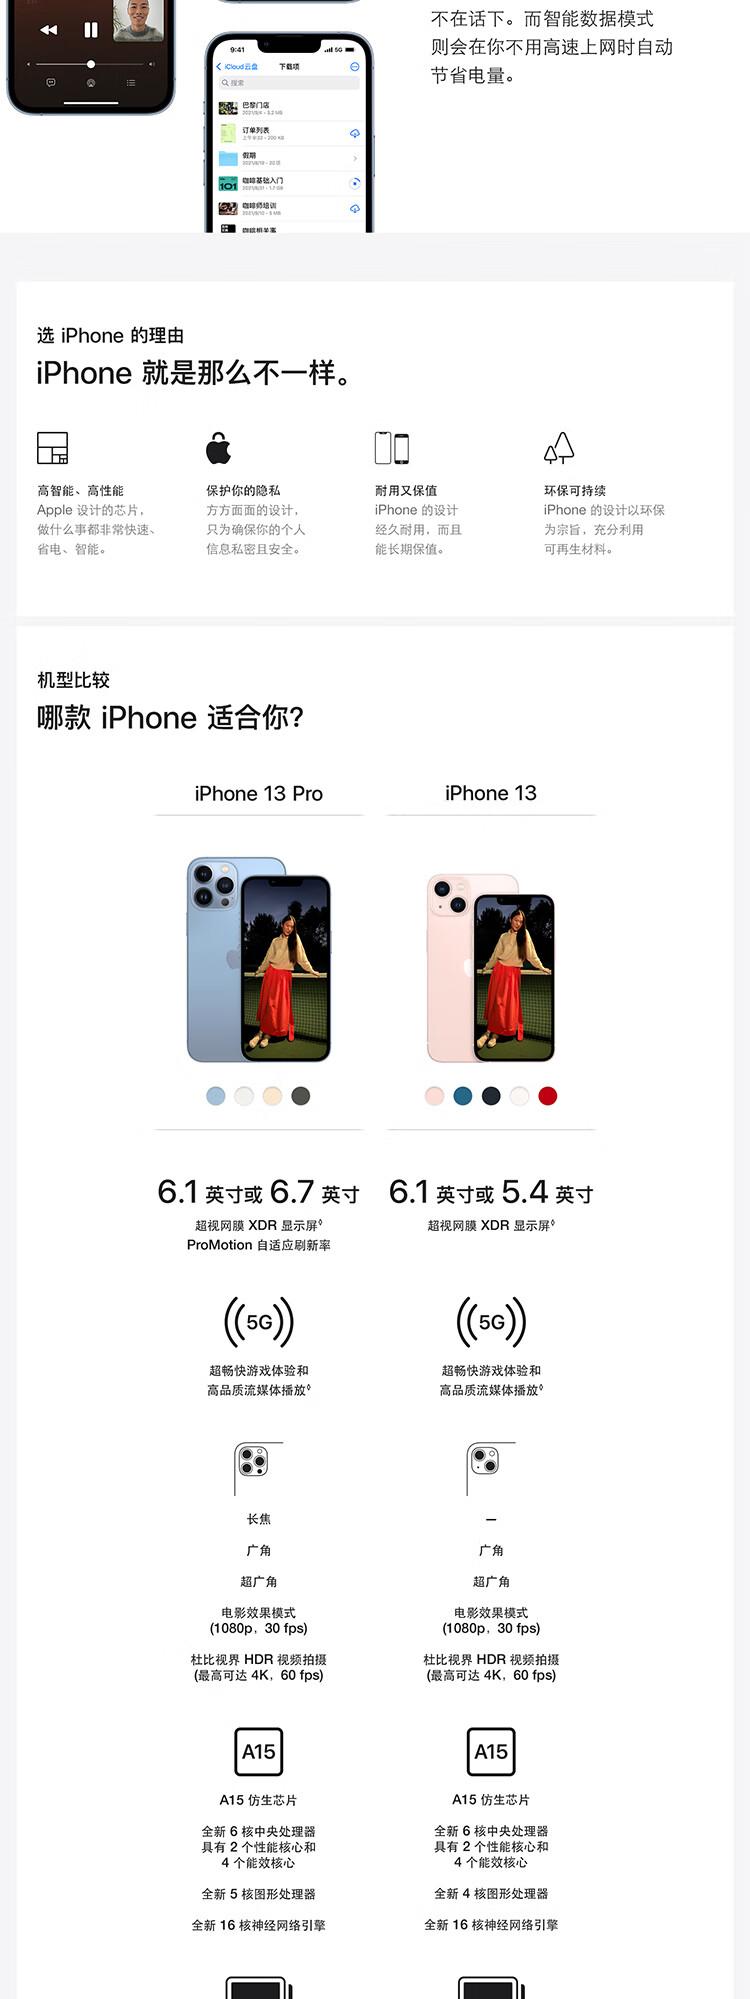 Apple iPhone 13 Pro Max (A2644) 256GB 远峰蓝色 支持移动联通电信5G 双卡双待手机